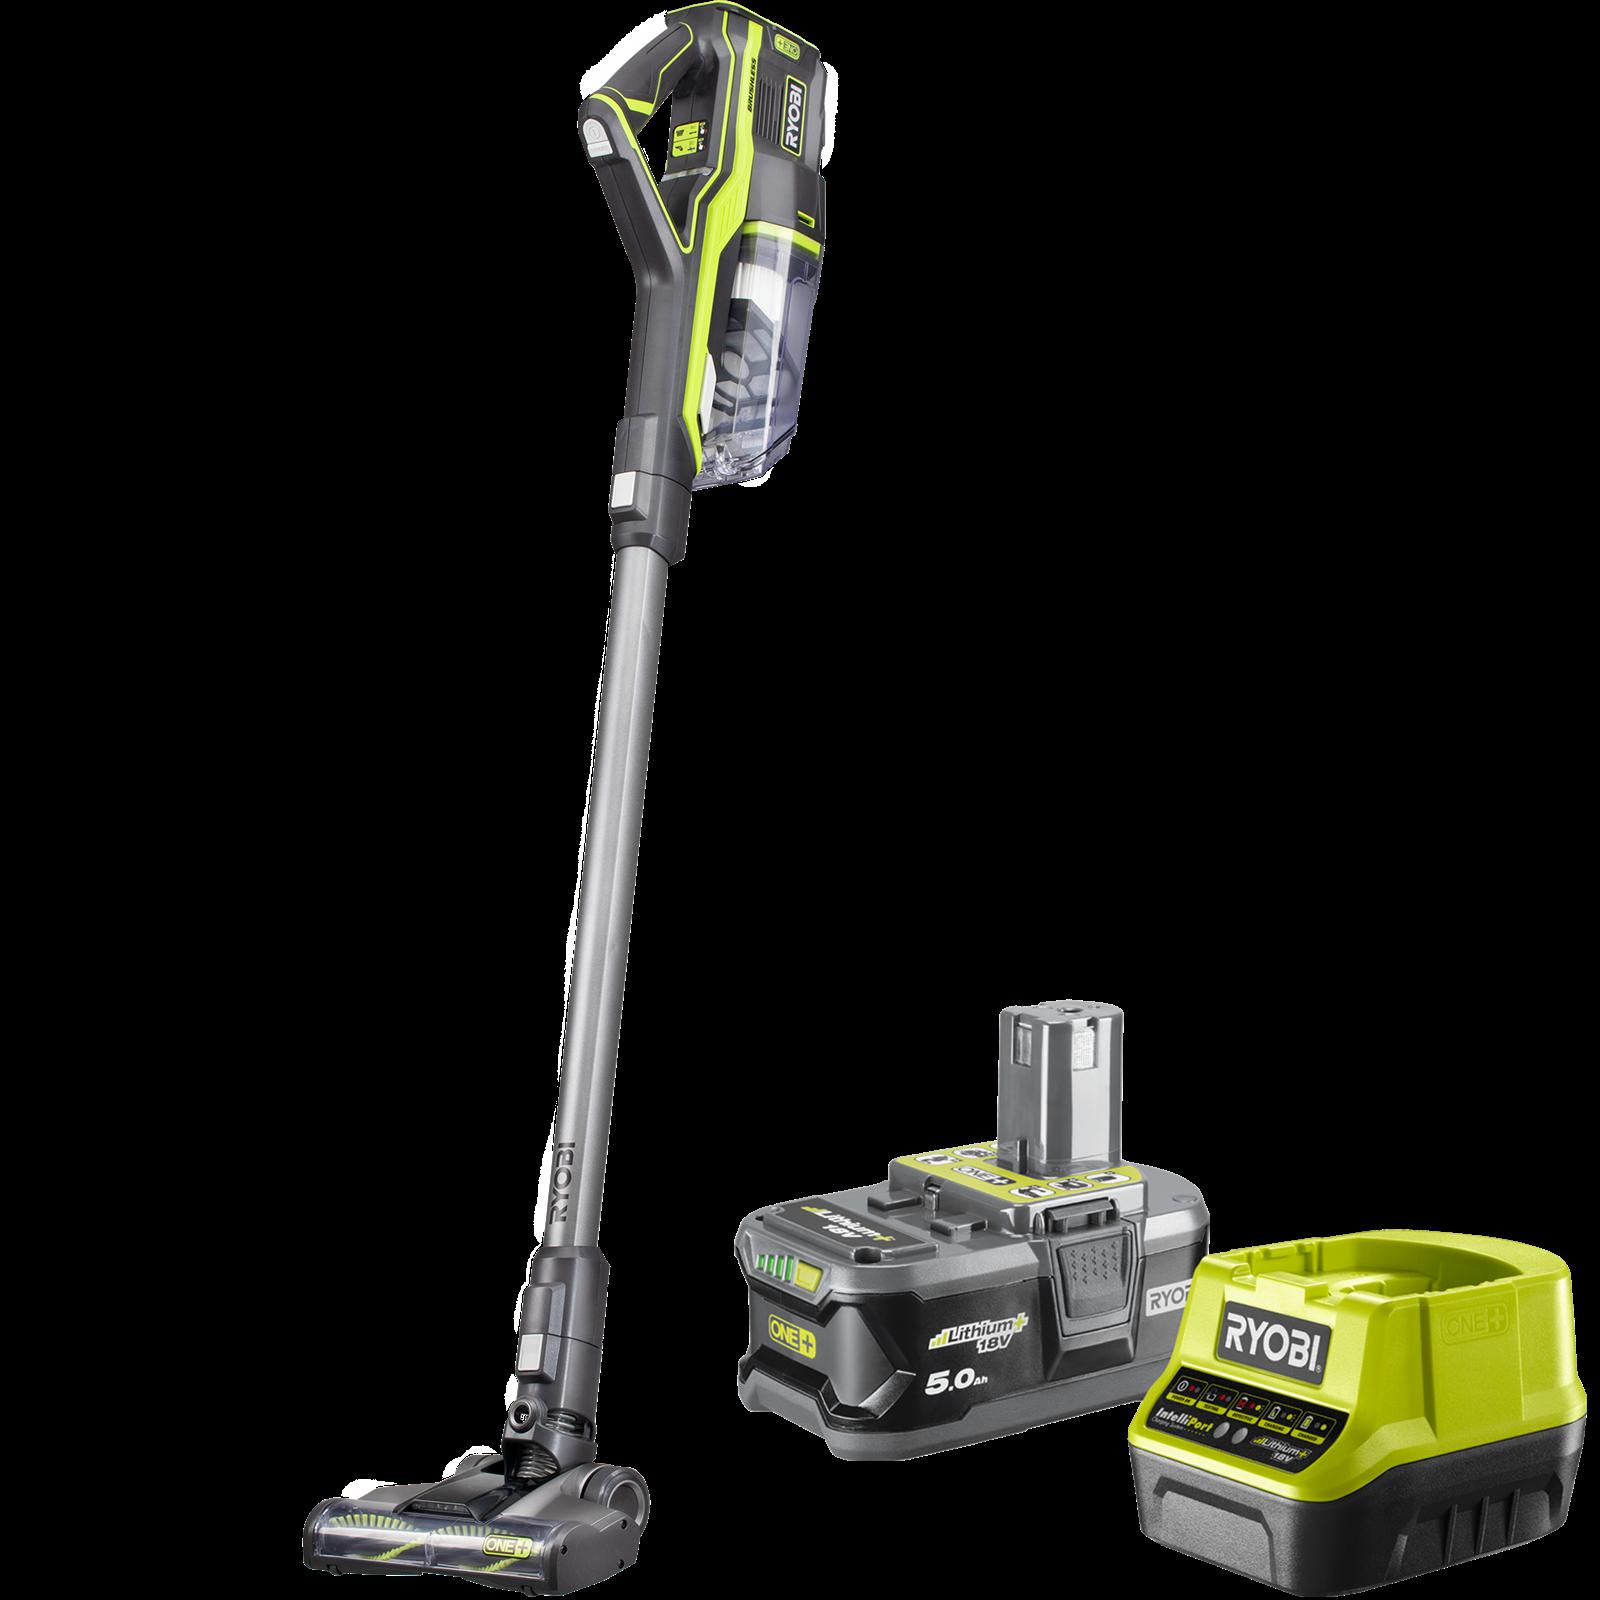 Ryobi One+ 18V 5.0Ah Brushless Stick Vacuum Kit